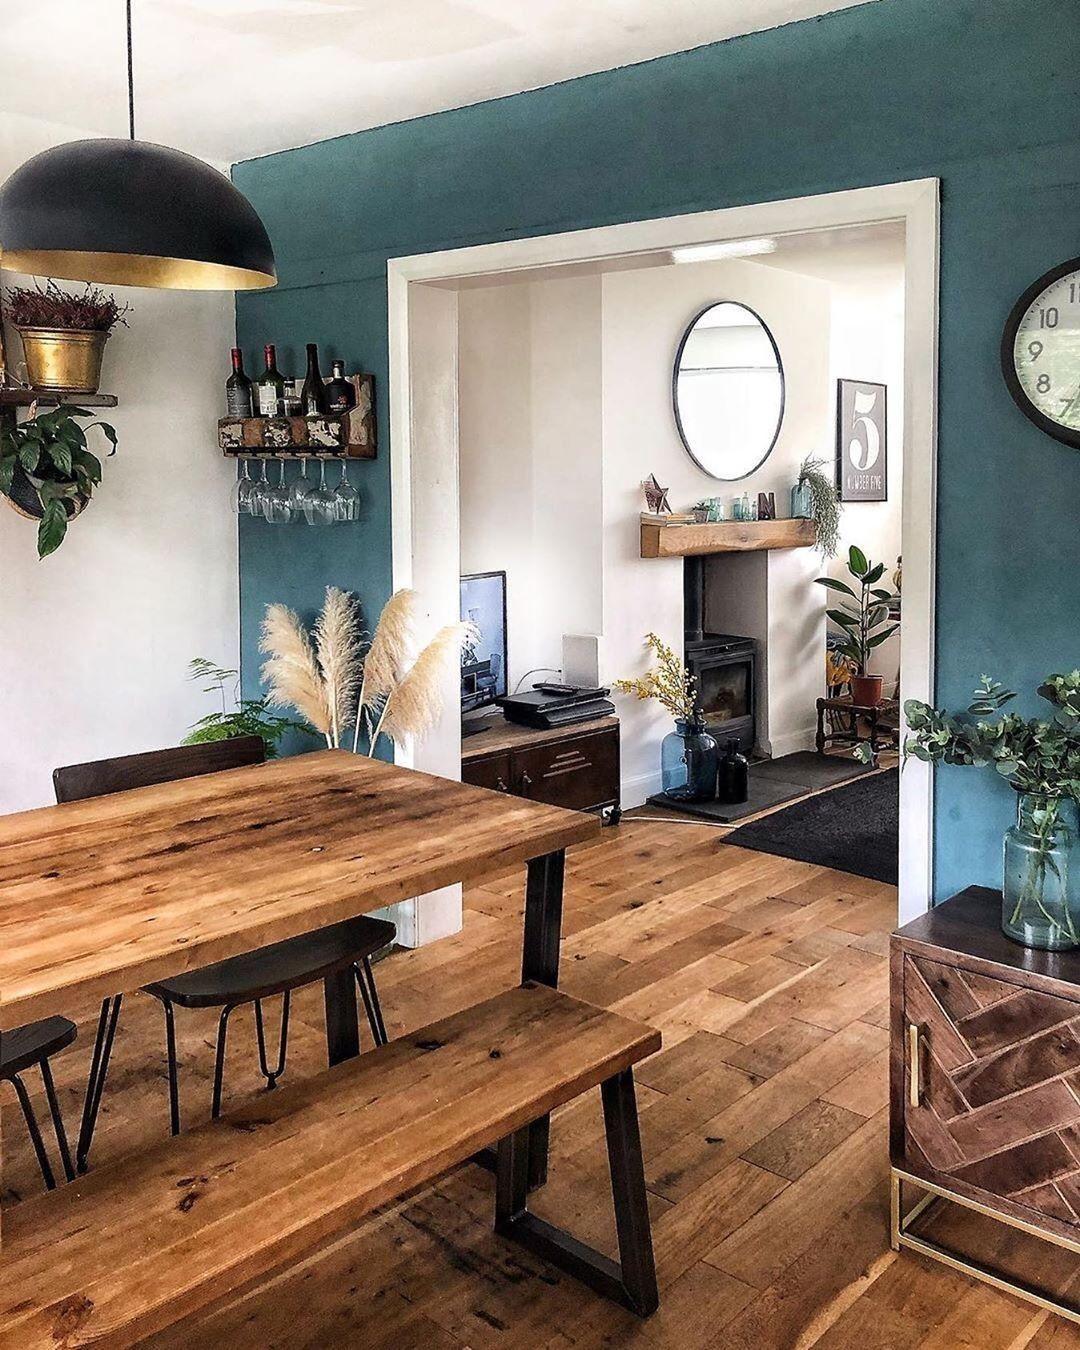 49 Best Ideas How To Decorate Your Apartment Interior Design